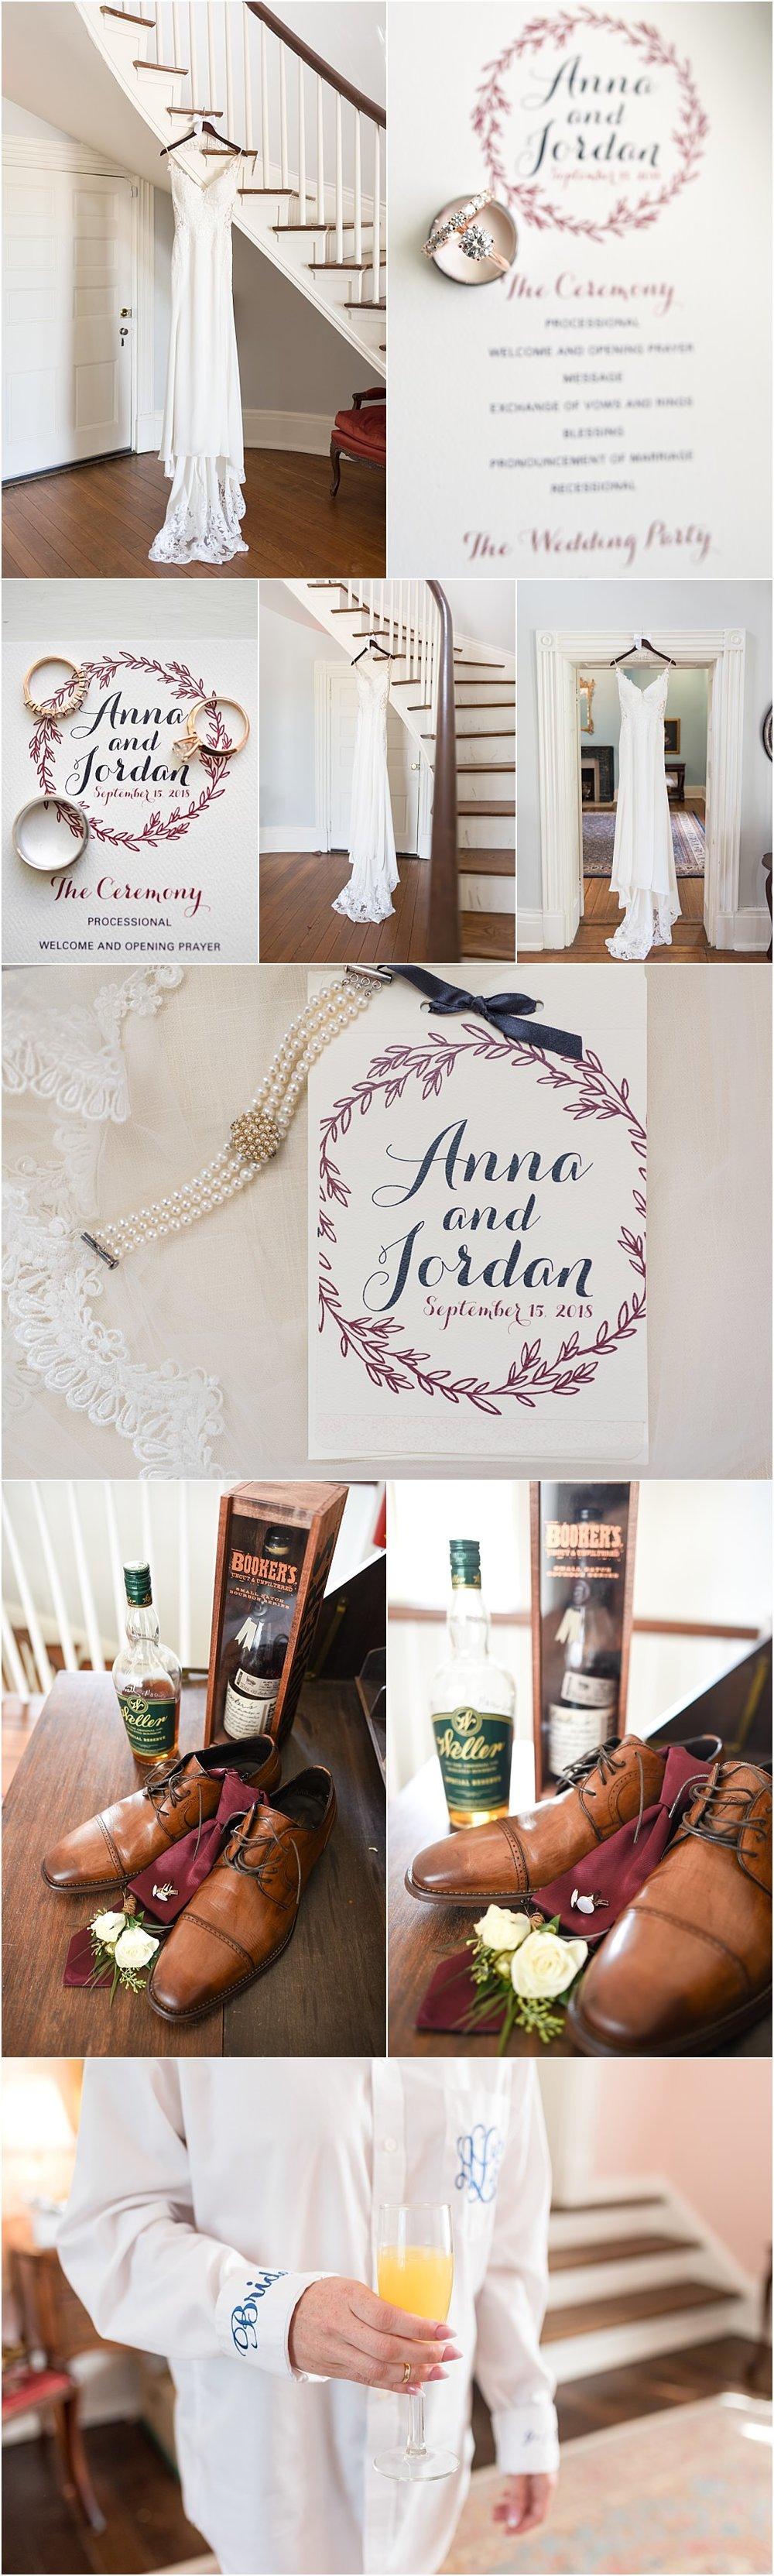 Jordan-and-Anna-Ravenswood-Mansion-Wedding-in-Brentwood-TN-Nashville-Wedding-Photographers+1